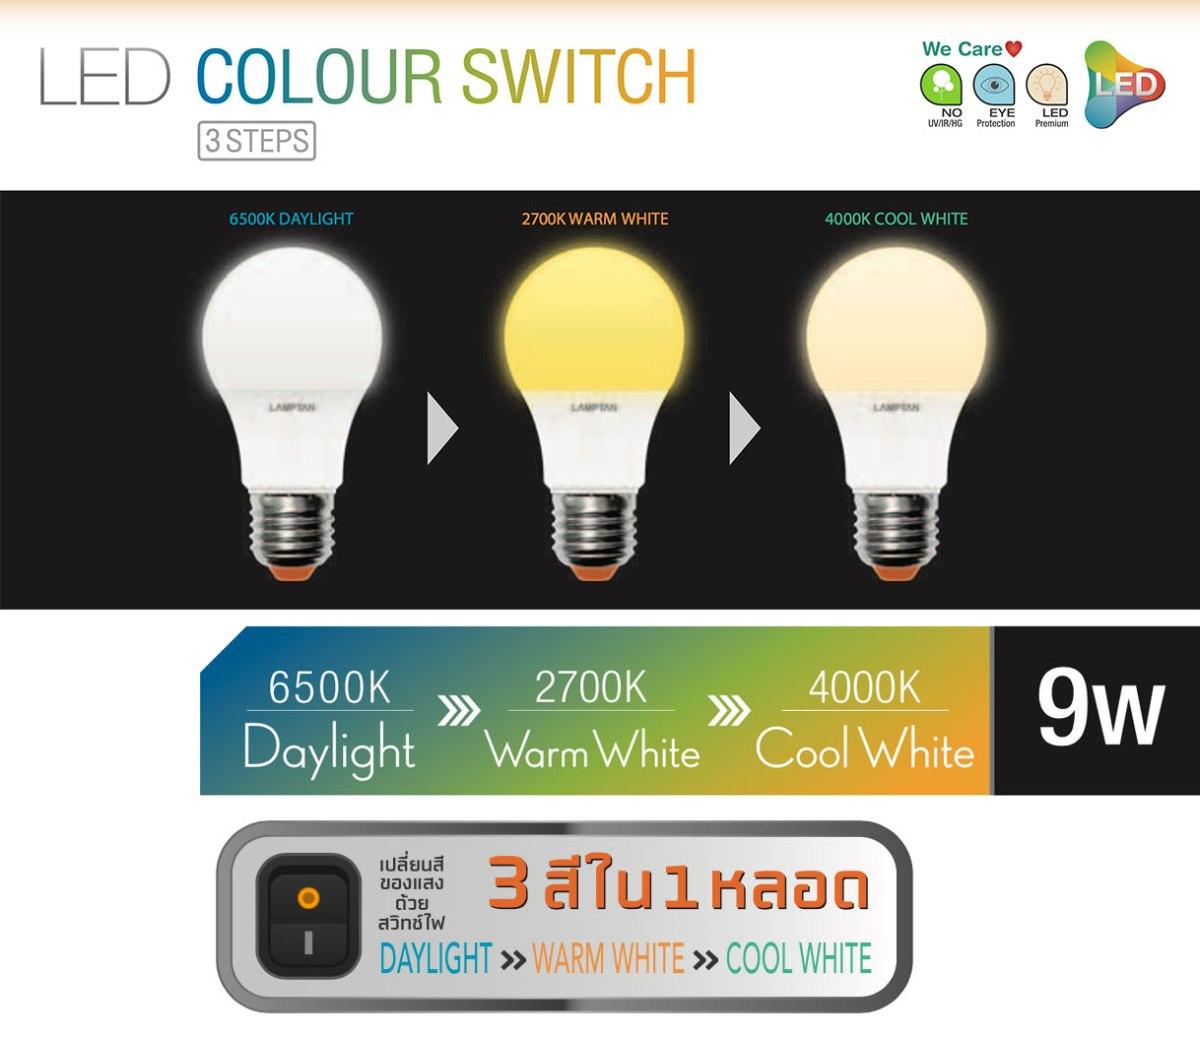 lamptan led colourswitch ทดสอบ 6 หลอดไฟอัจฉริยะของ LAMPTAN ว่าจะดีเหมือนในโฆษณาพี่เผือกรึเปล่า?